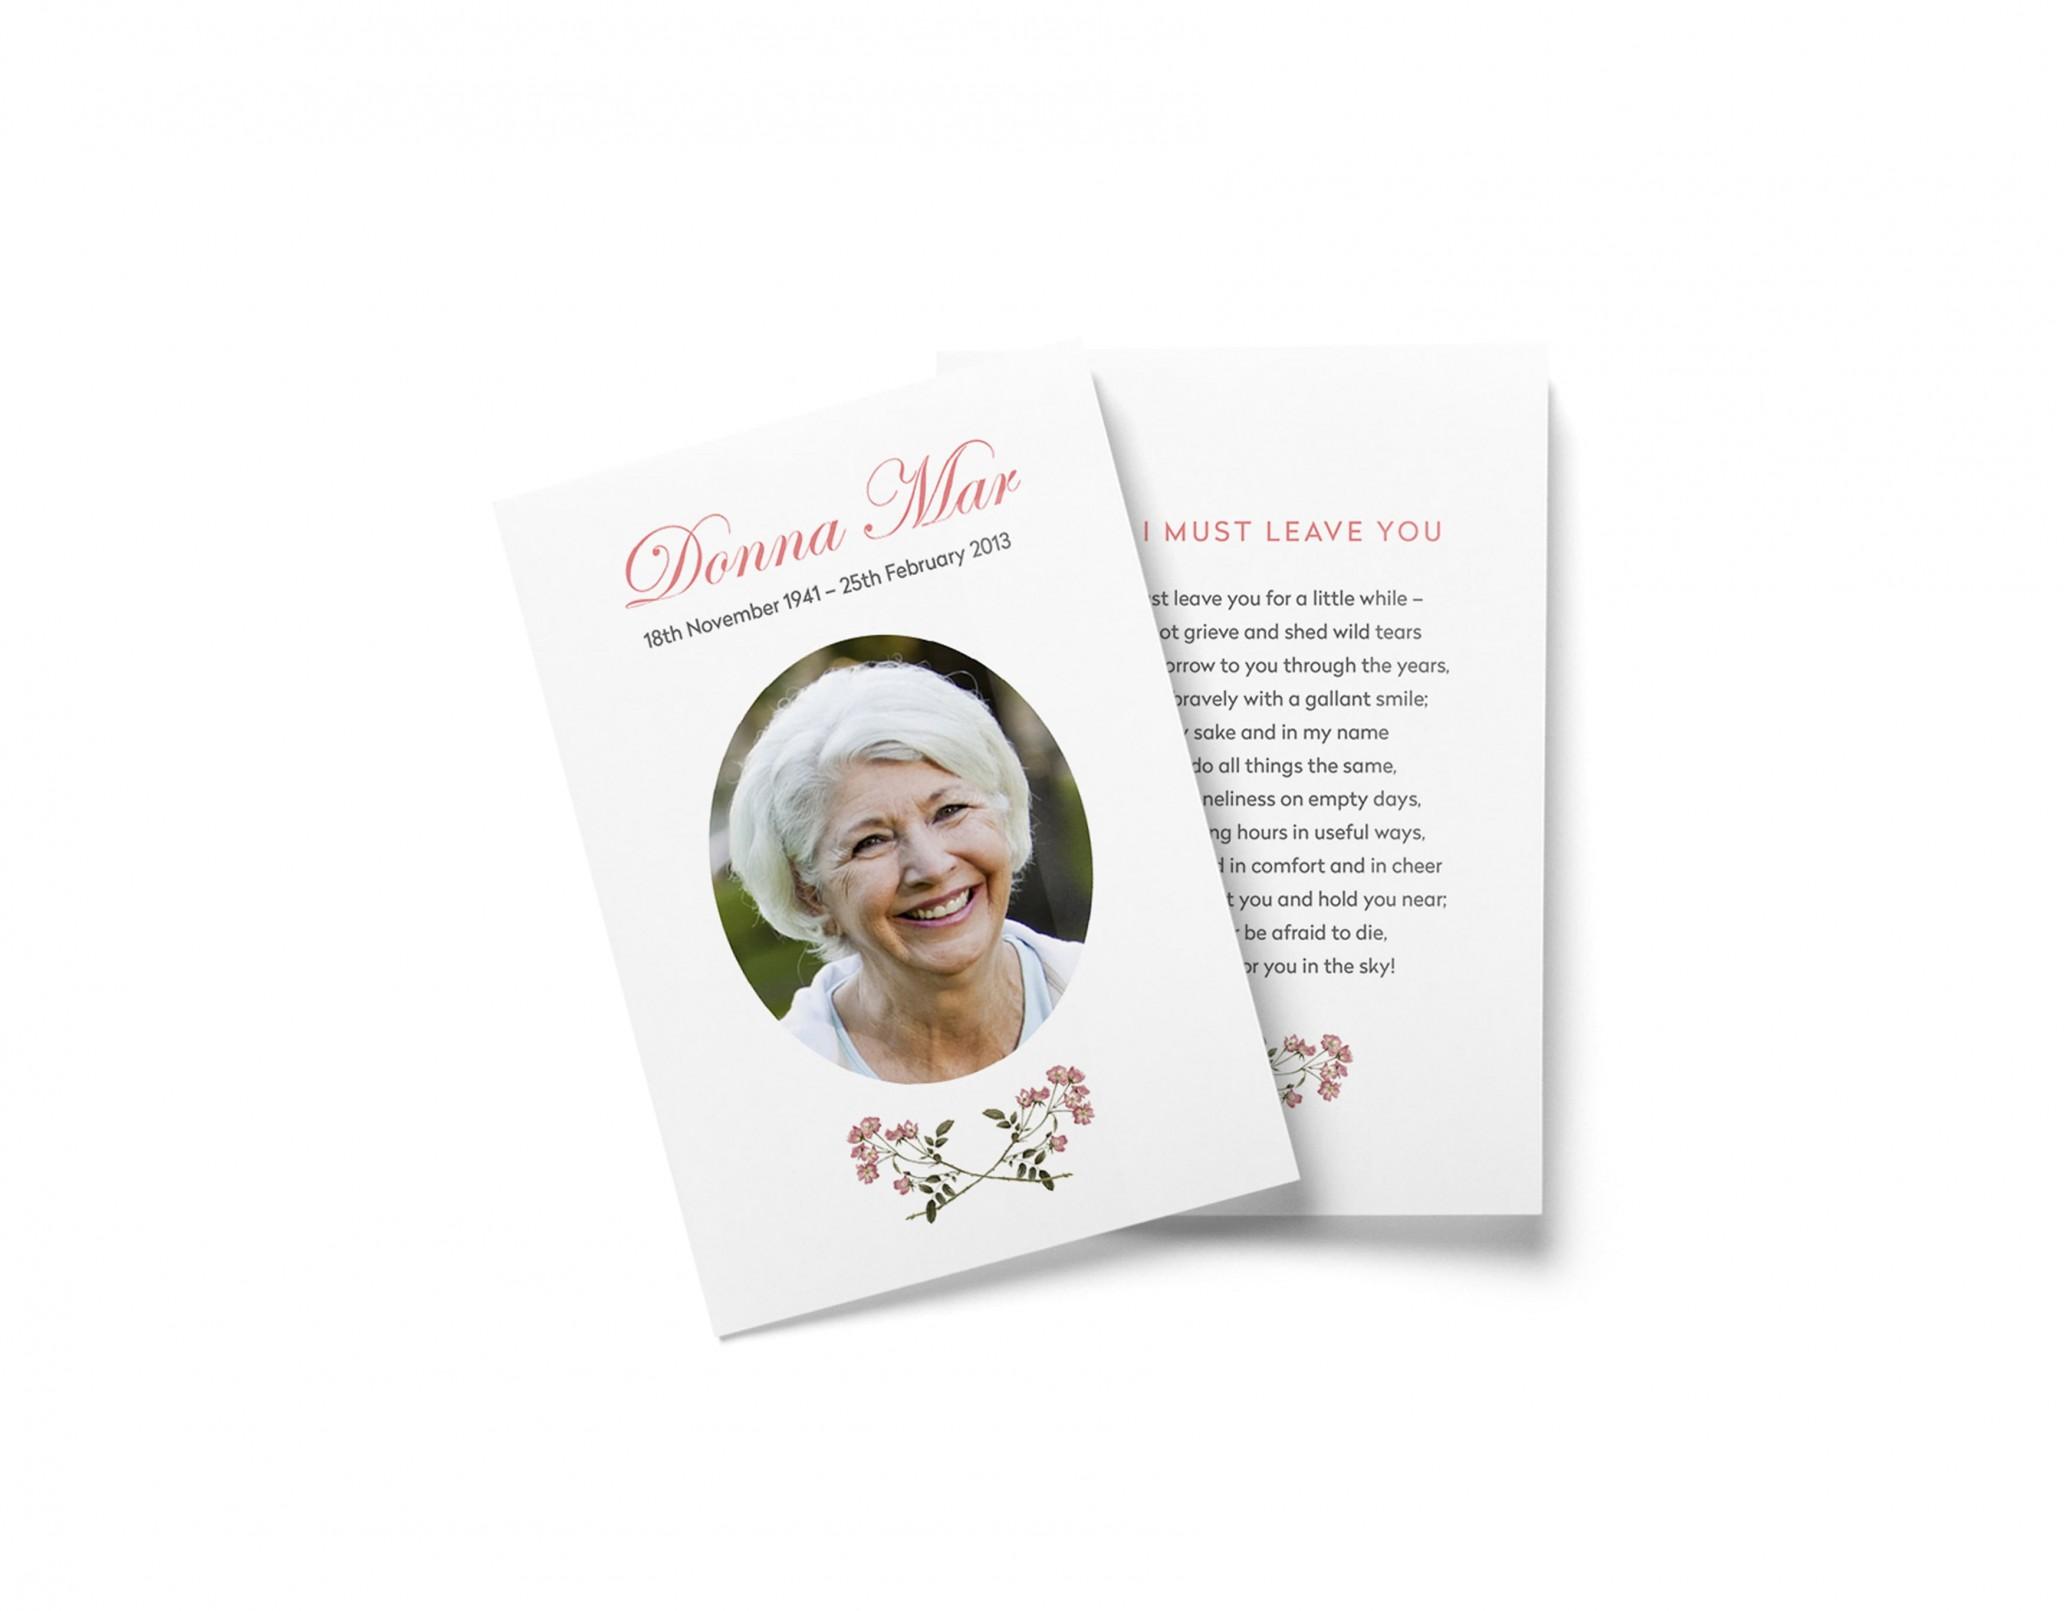 wedding invitations online sydney